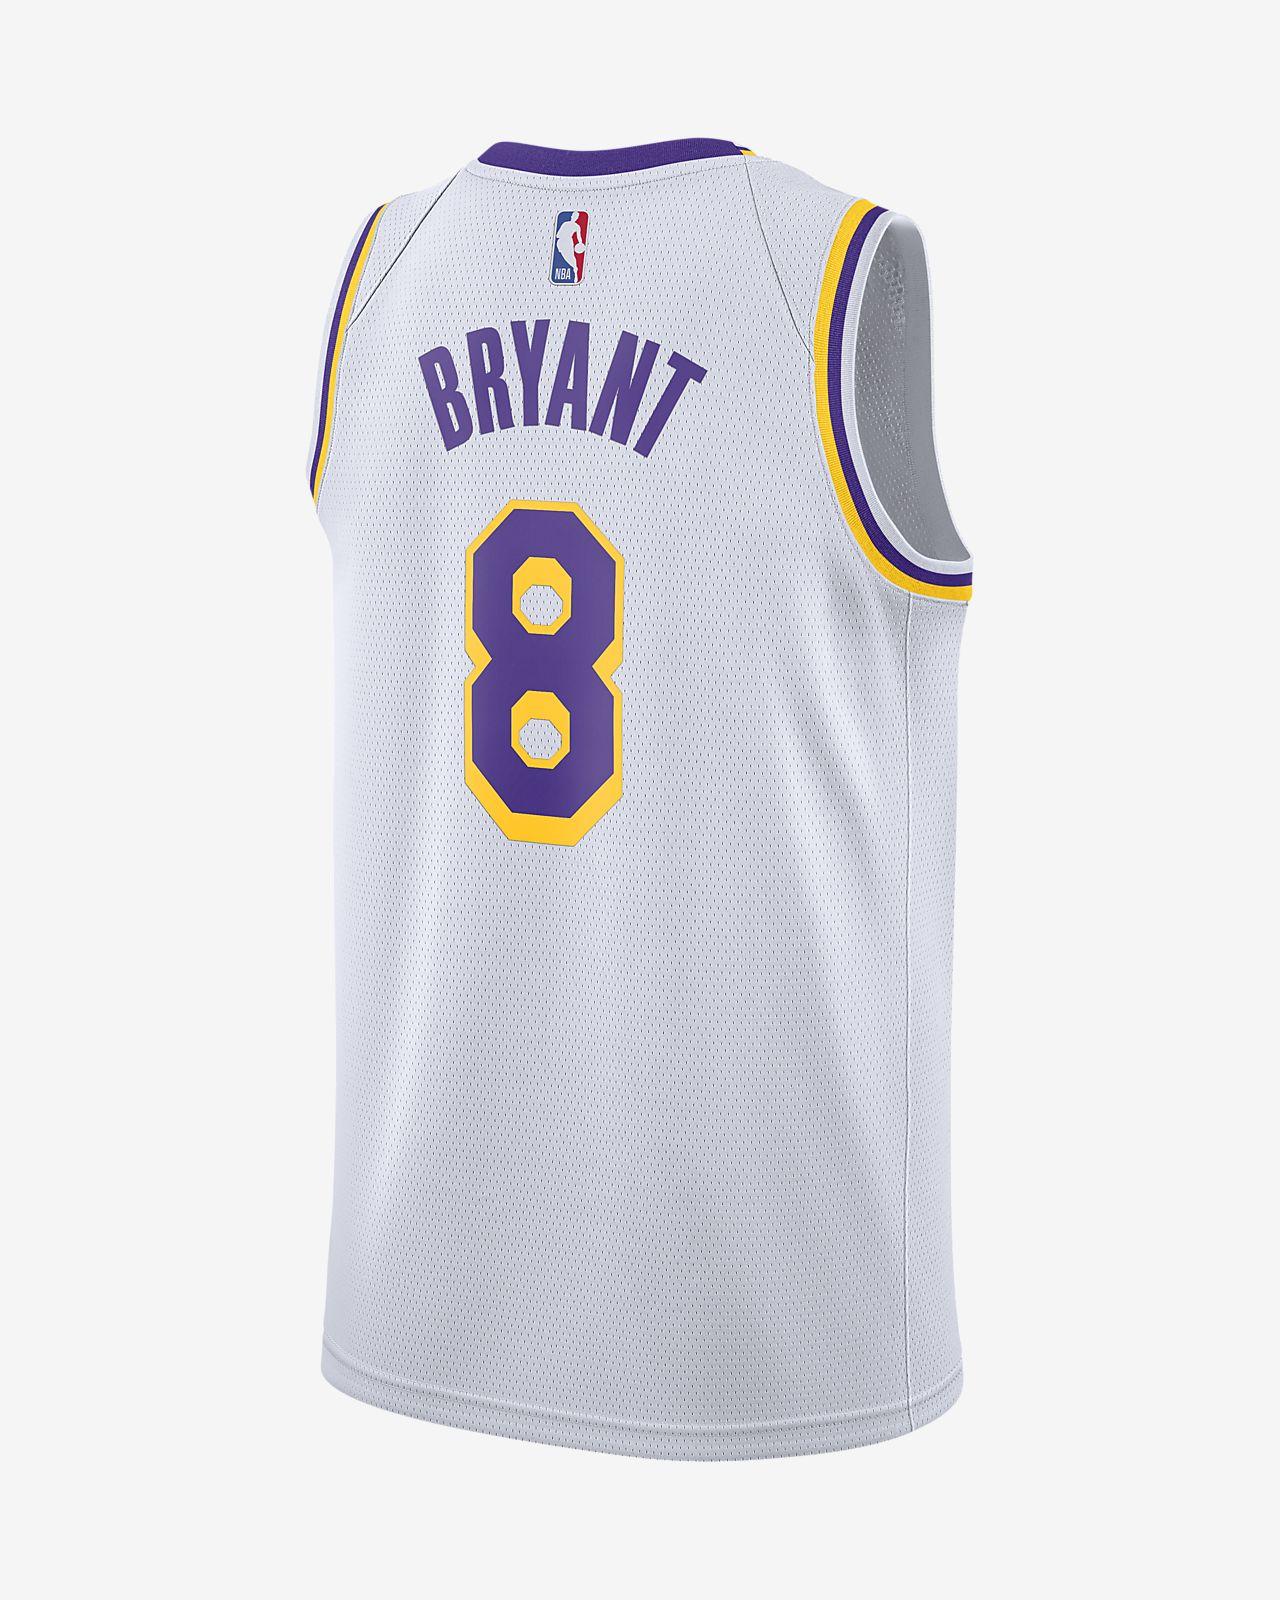 a7d789cd826 ... Kobe Bryant Association Edition Swingman (Los Angeles Lakers) Men's Nike  NBA Connected Jersey